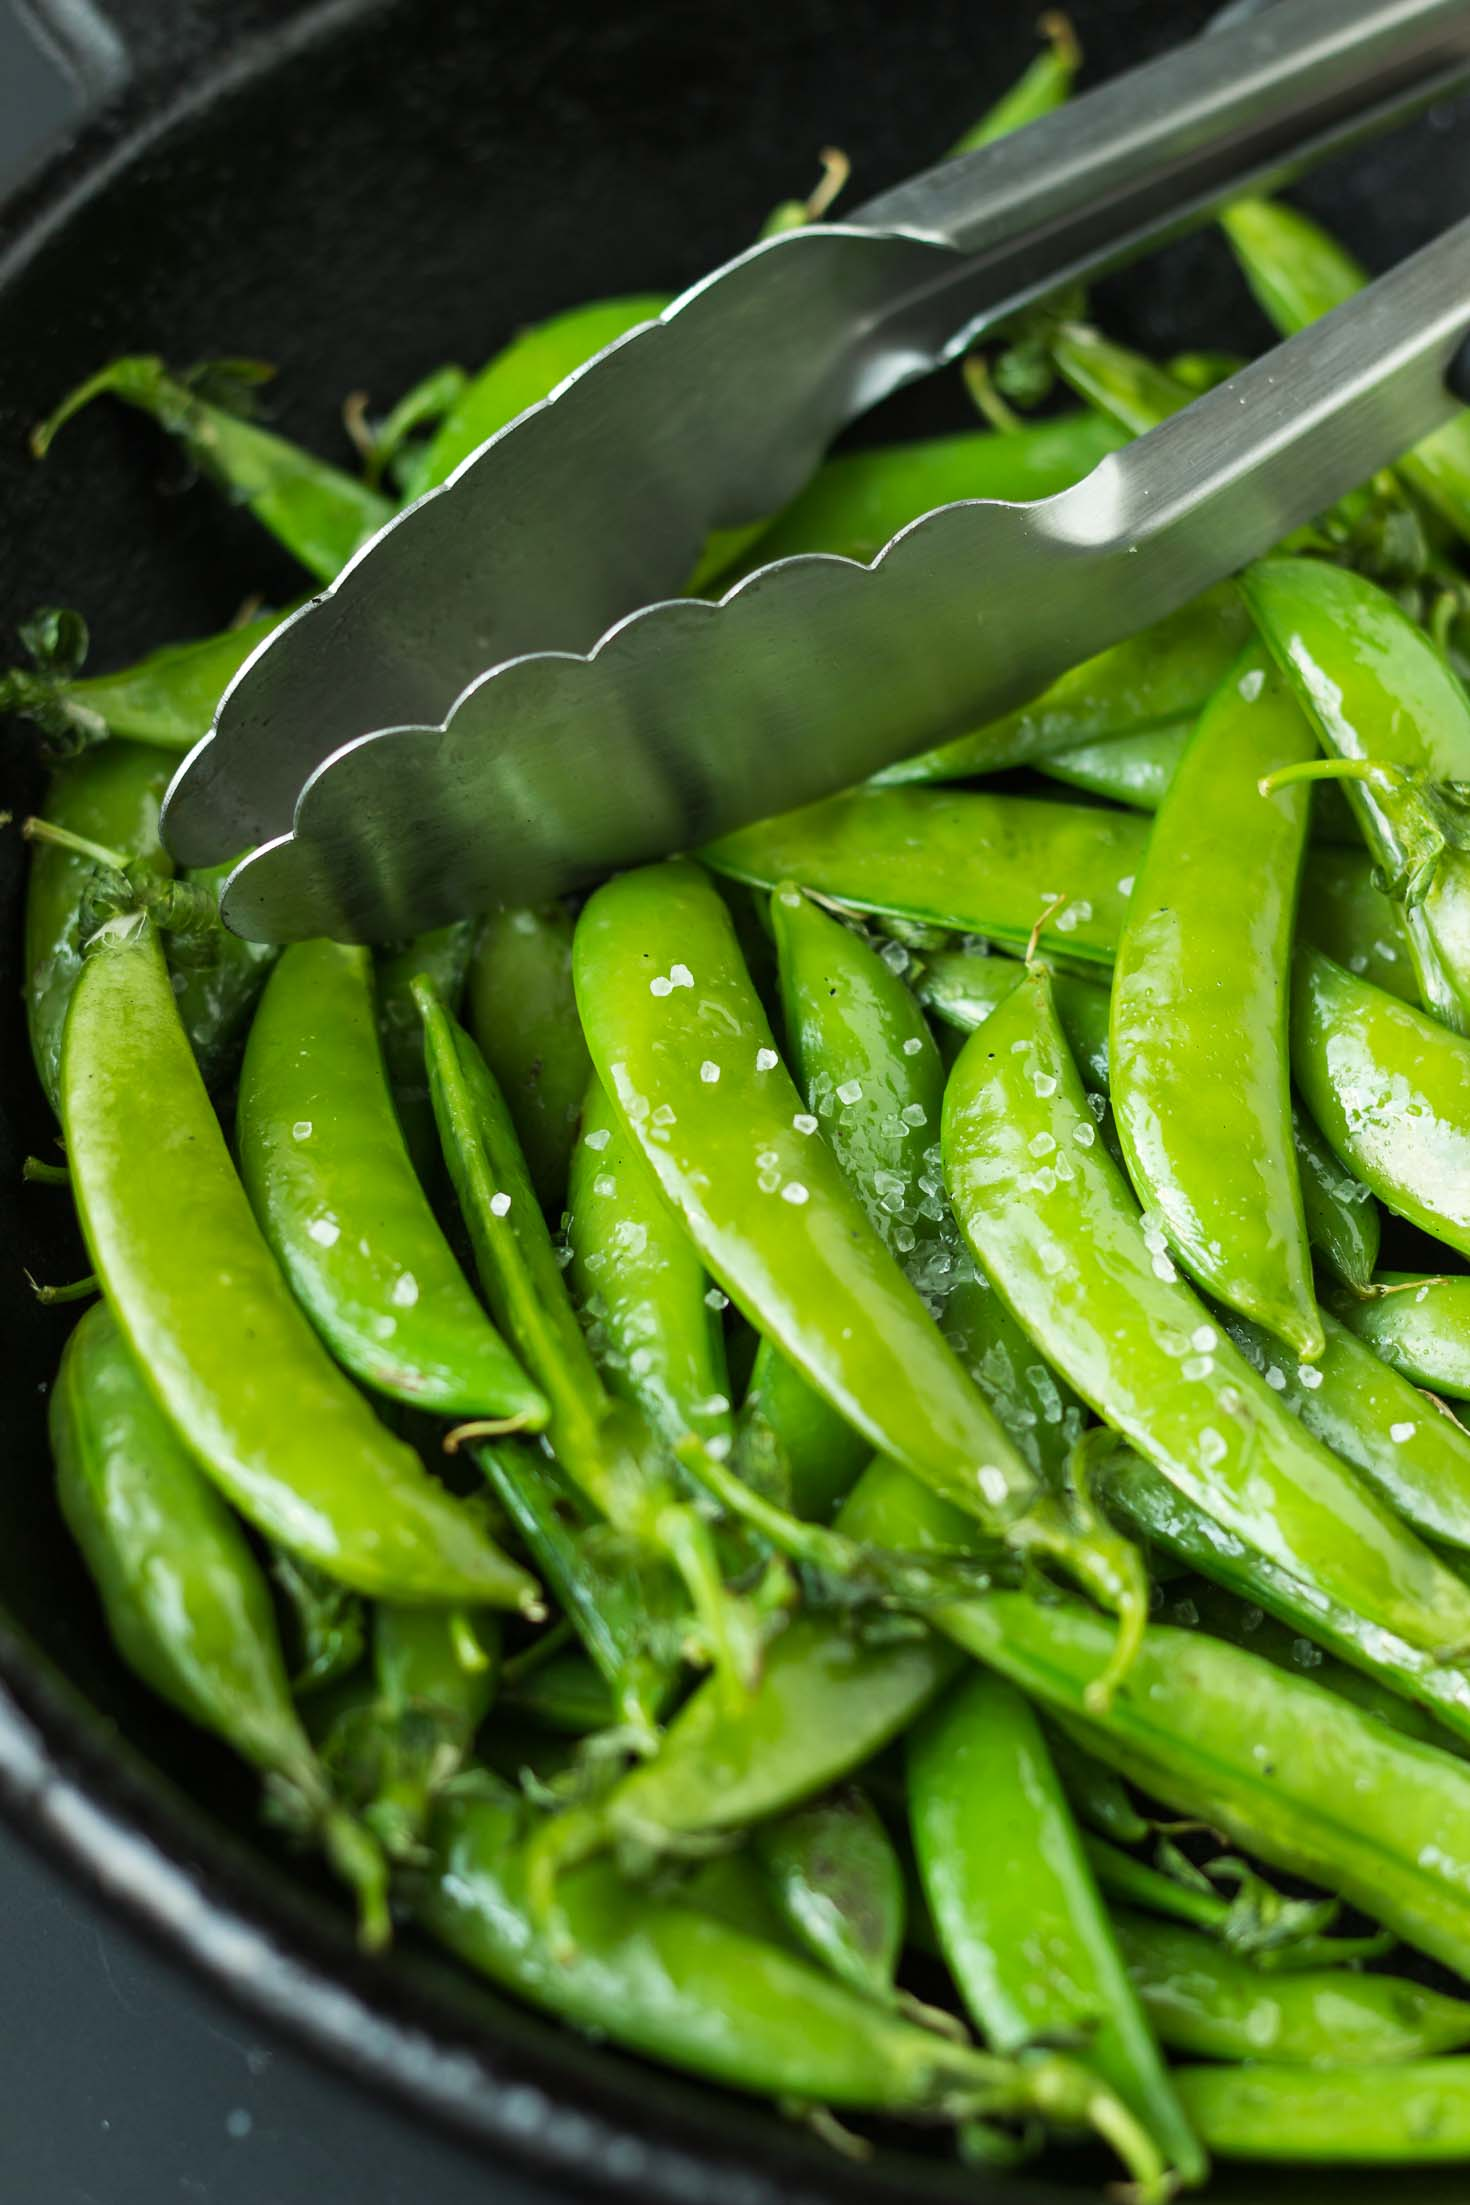 8-Minute Asian Peas Stir-Fry with Sesame Seeds